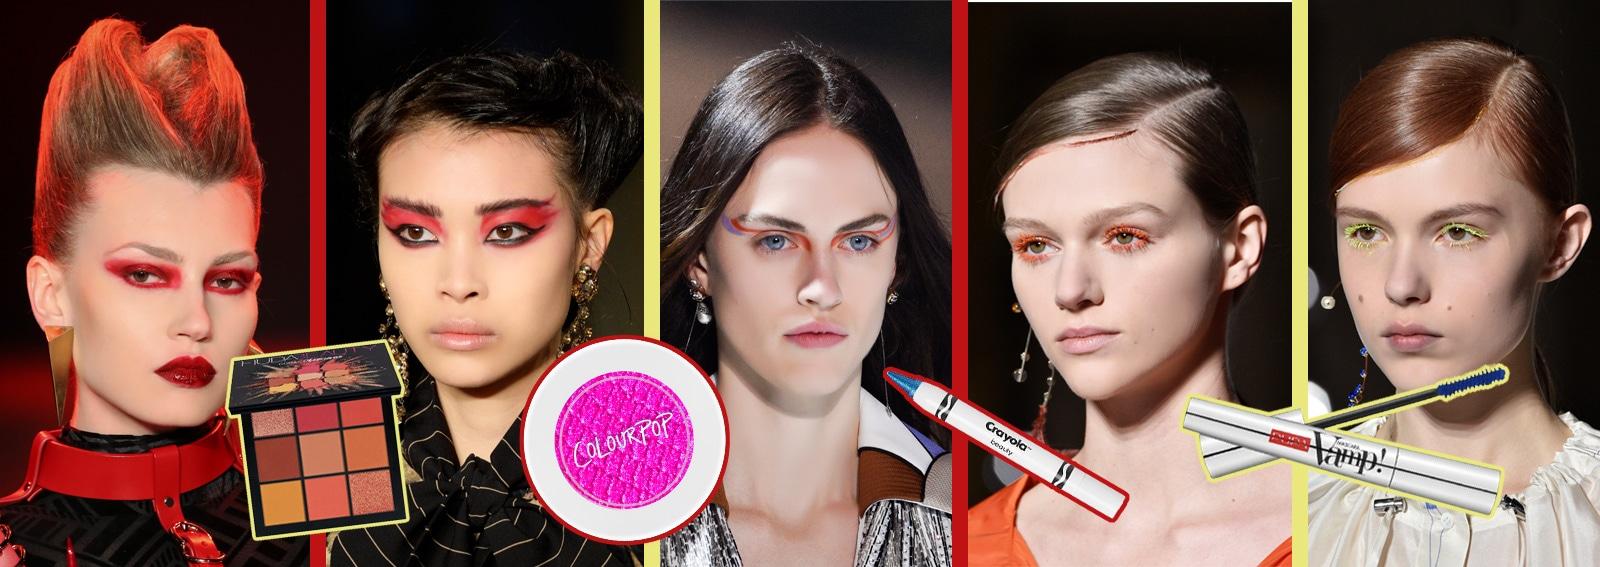 DESKTOP_neon-make-up-(foto-modelle-+-prodotti)